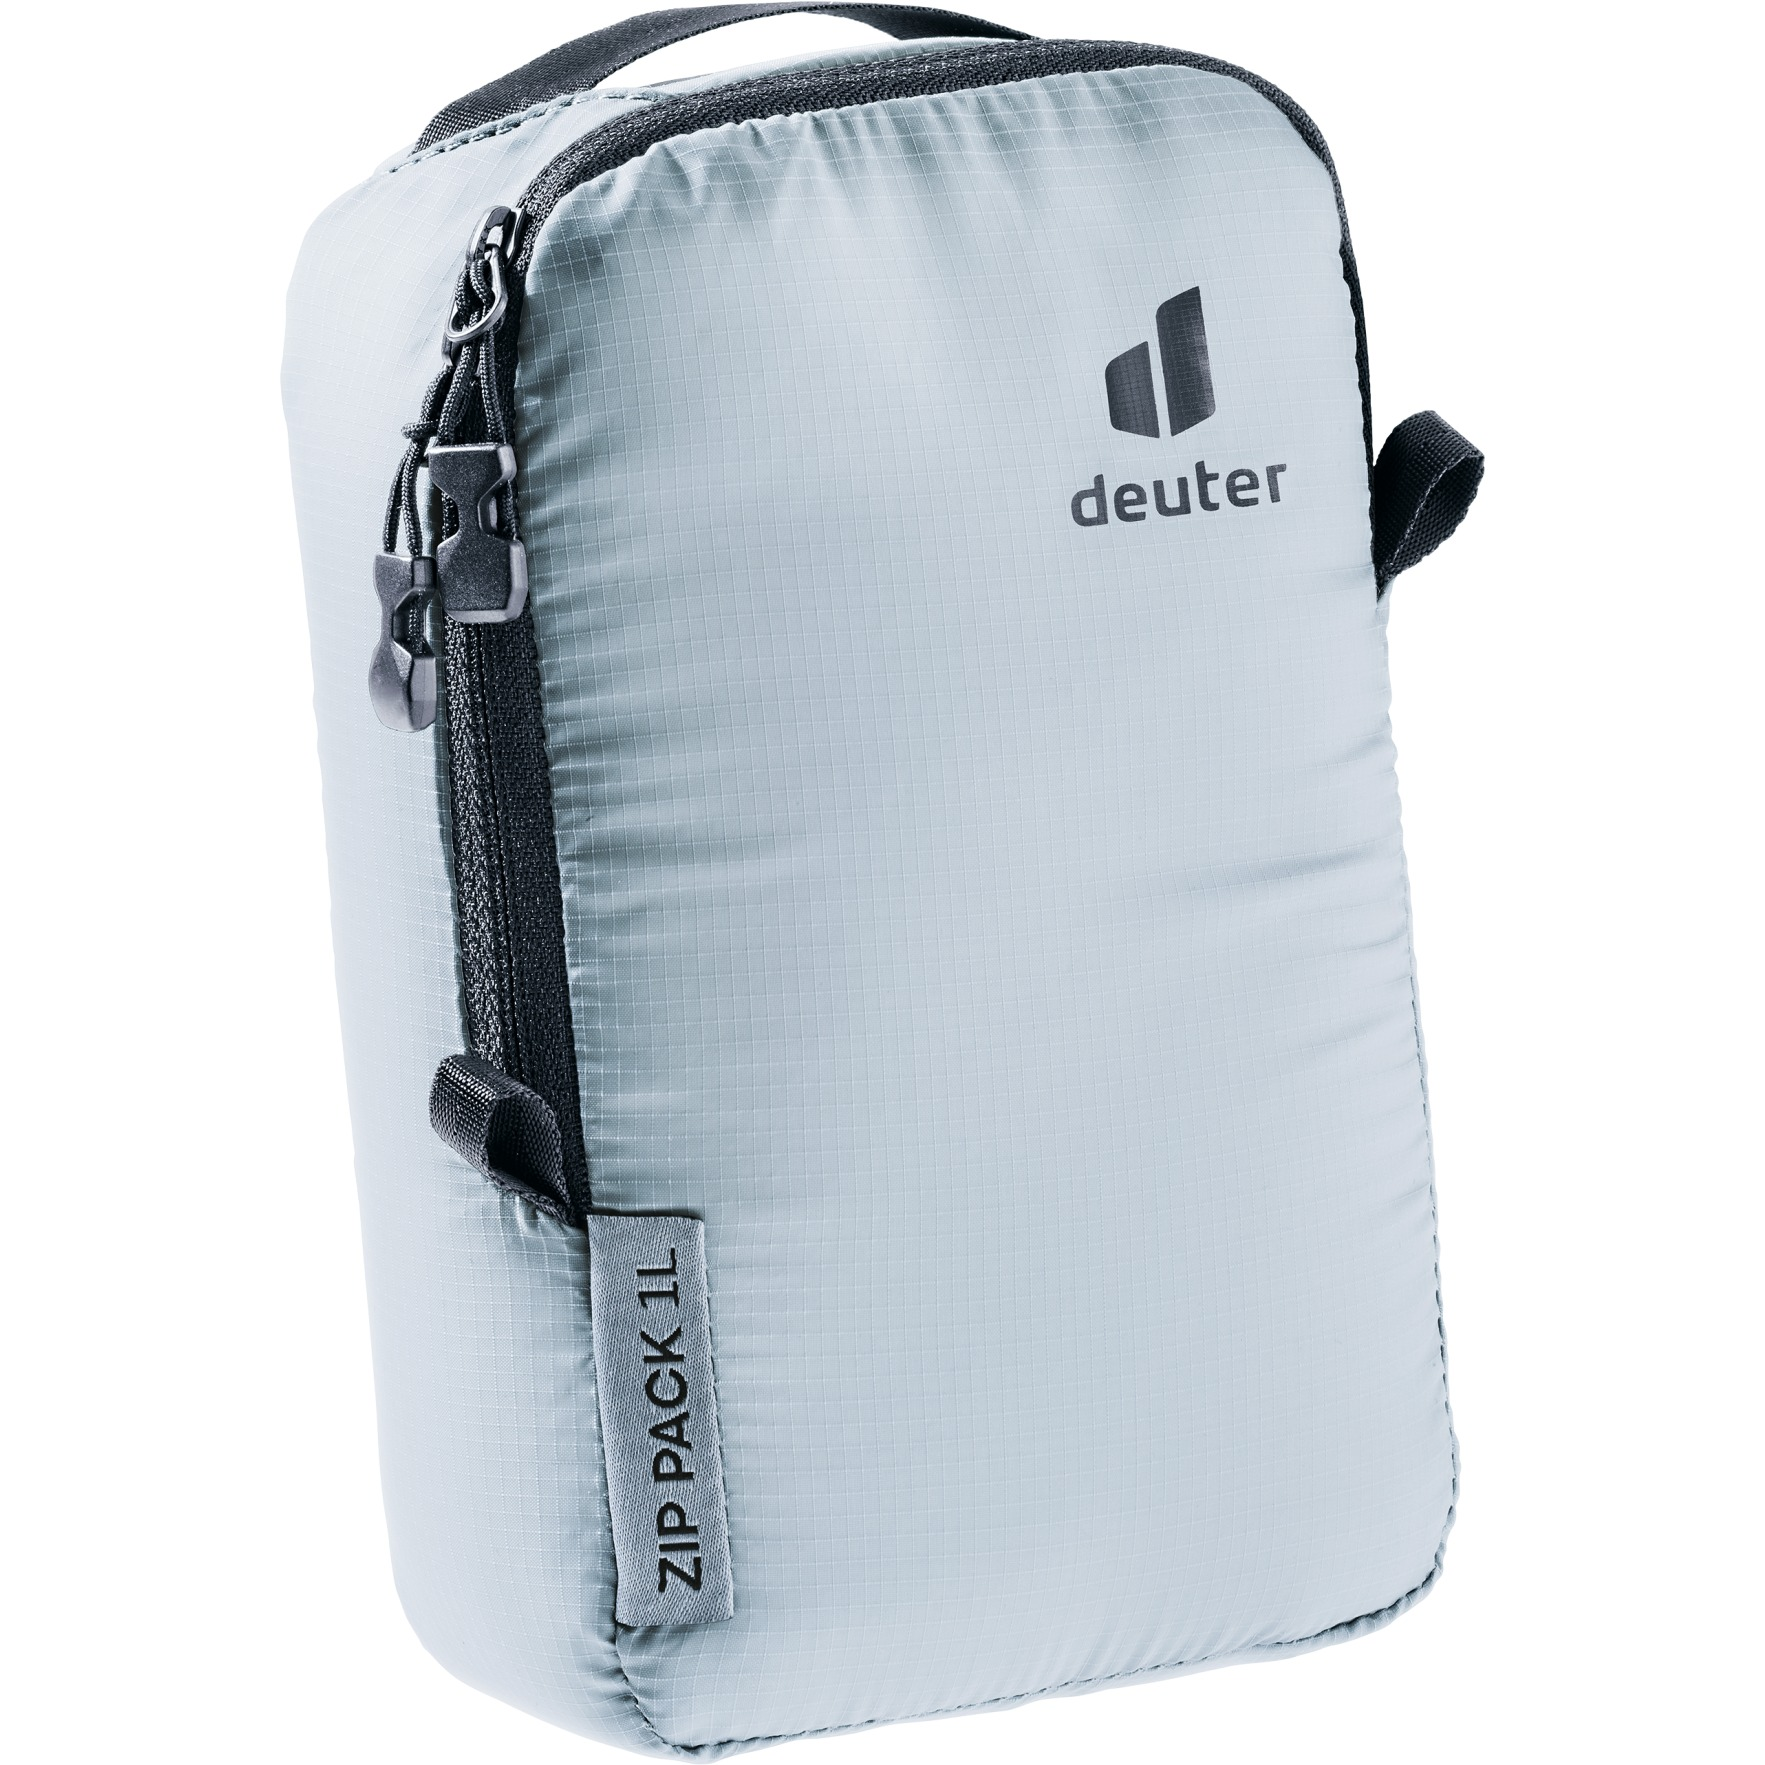 Deuter Zip Pack 1 liter - tin